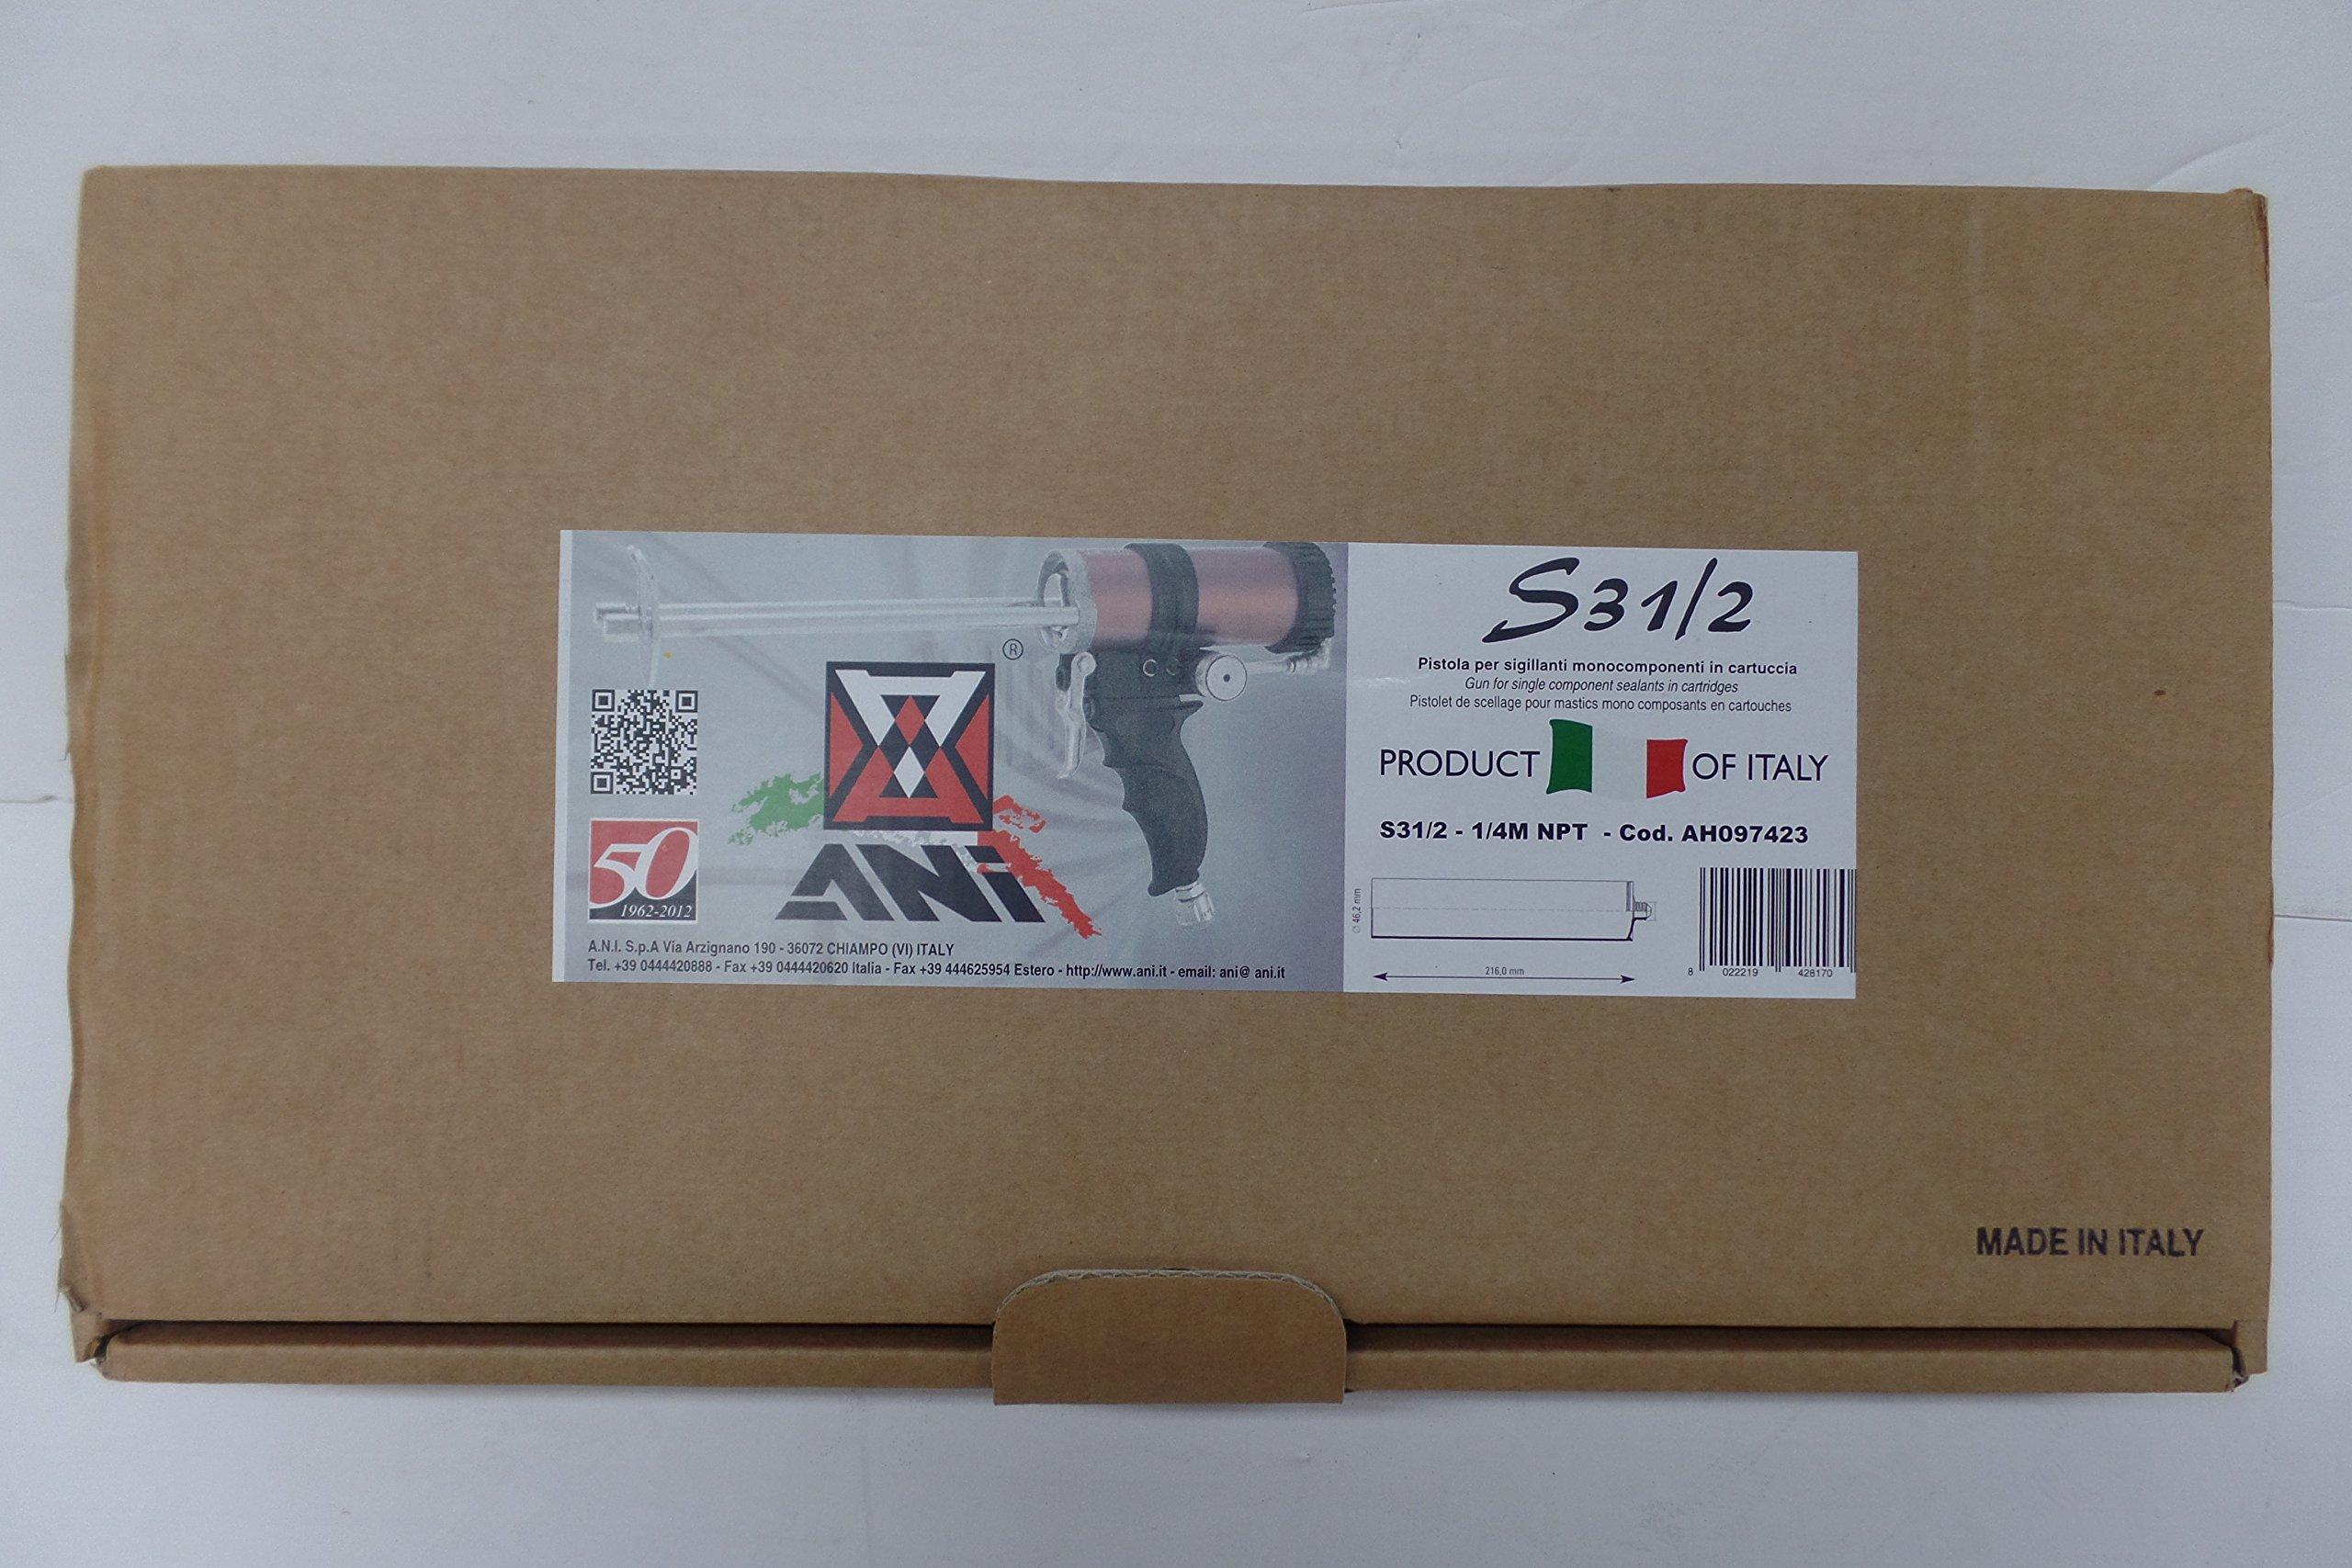 S31/2 caulking seam single component sealant gun by S31/2 (Image #1)